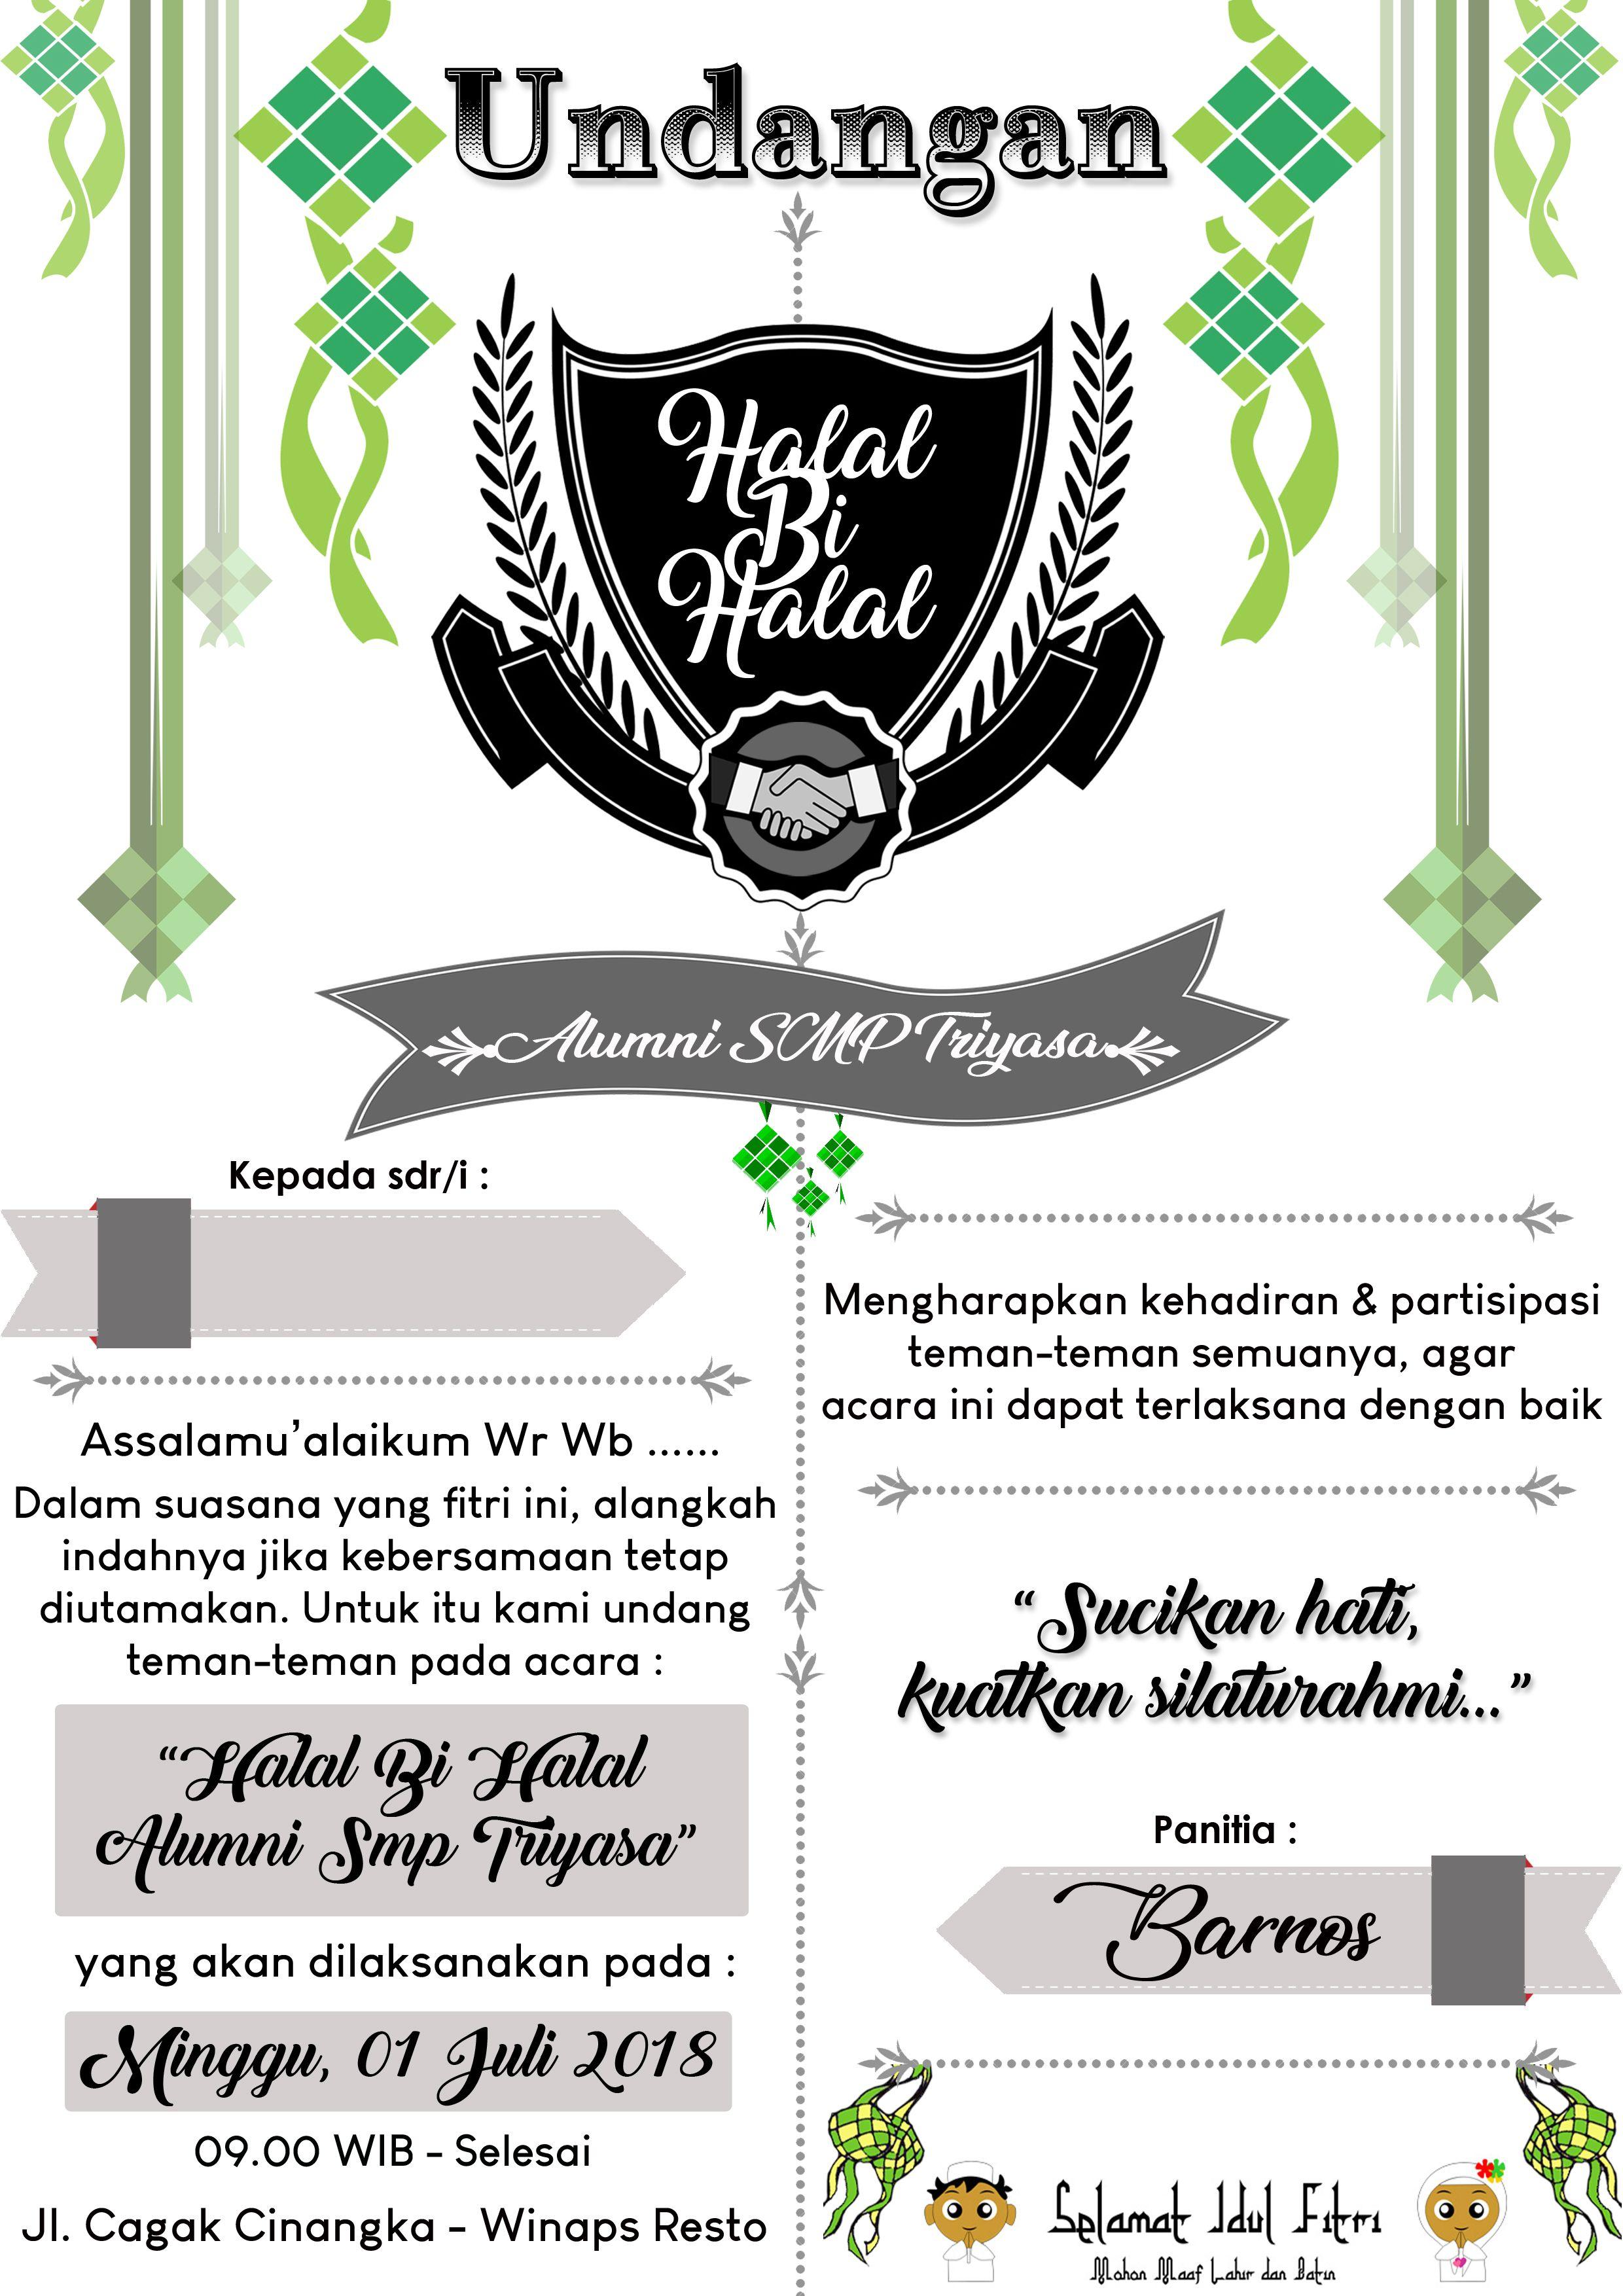 Contoh Undangan Halal Bi Halal Made By Me My Portofolio Cards